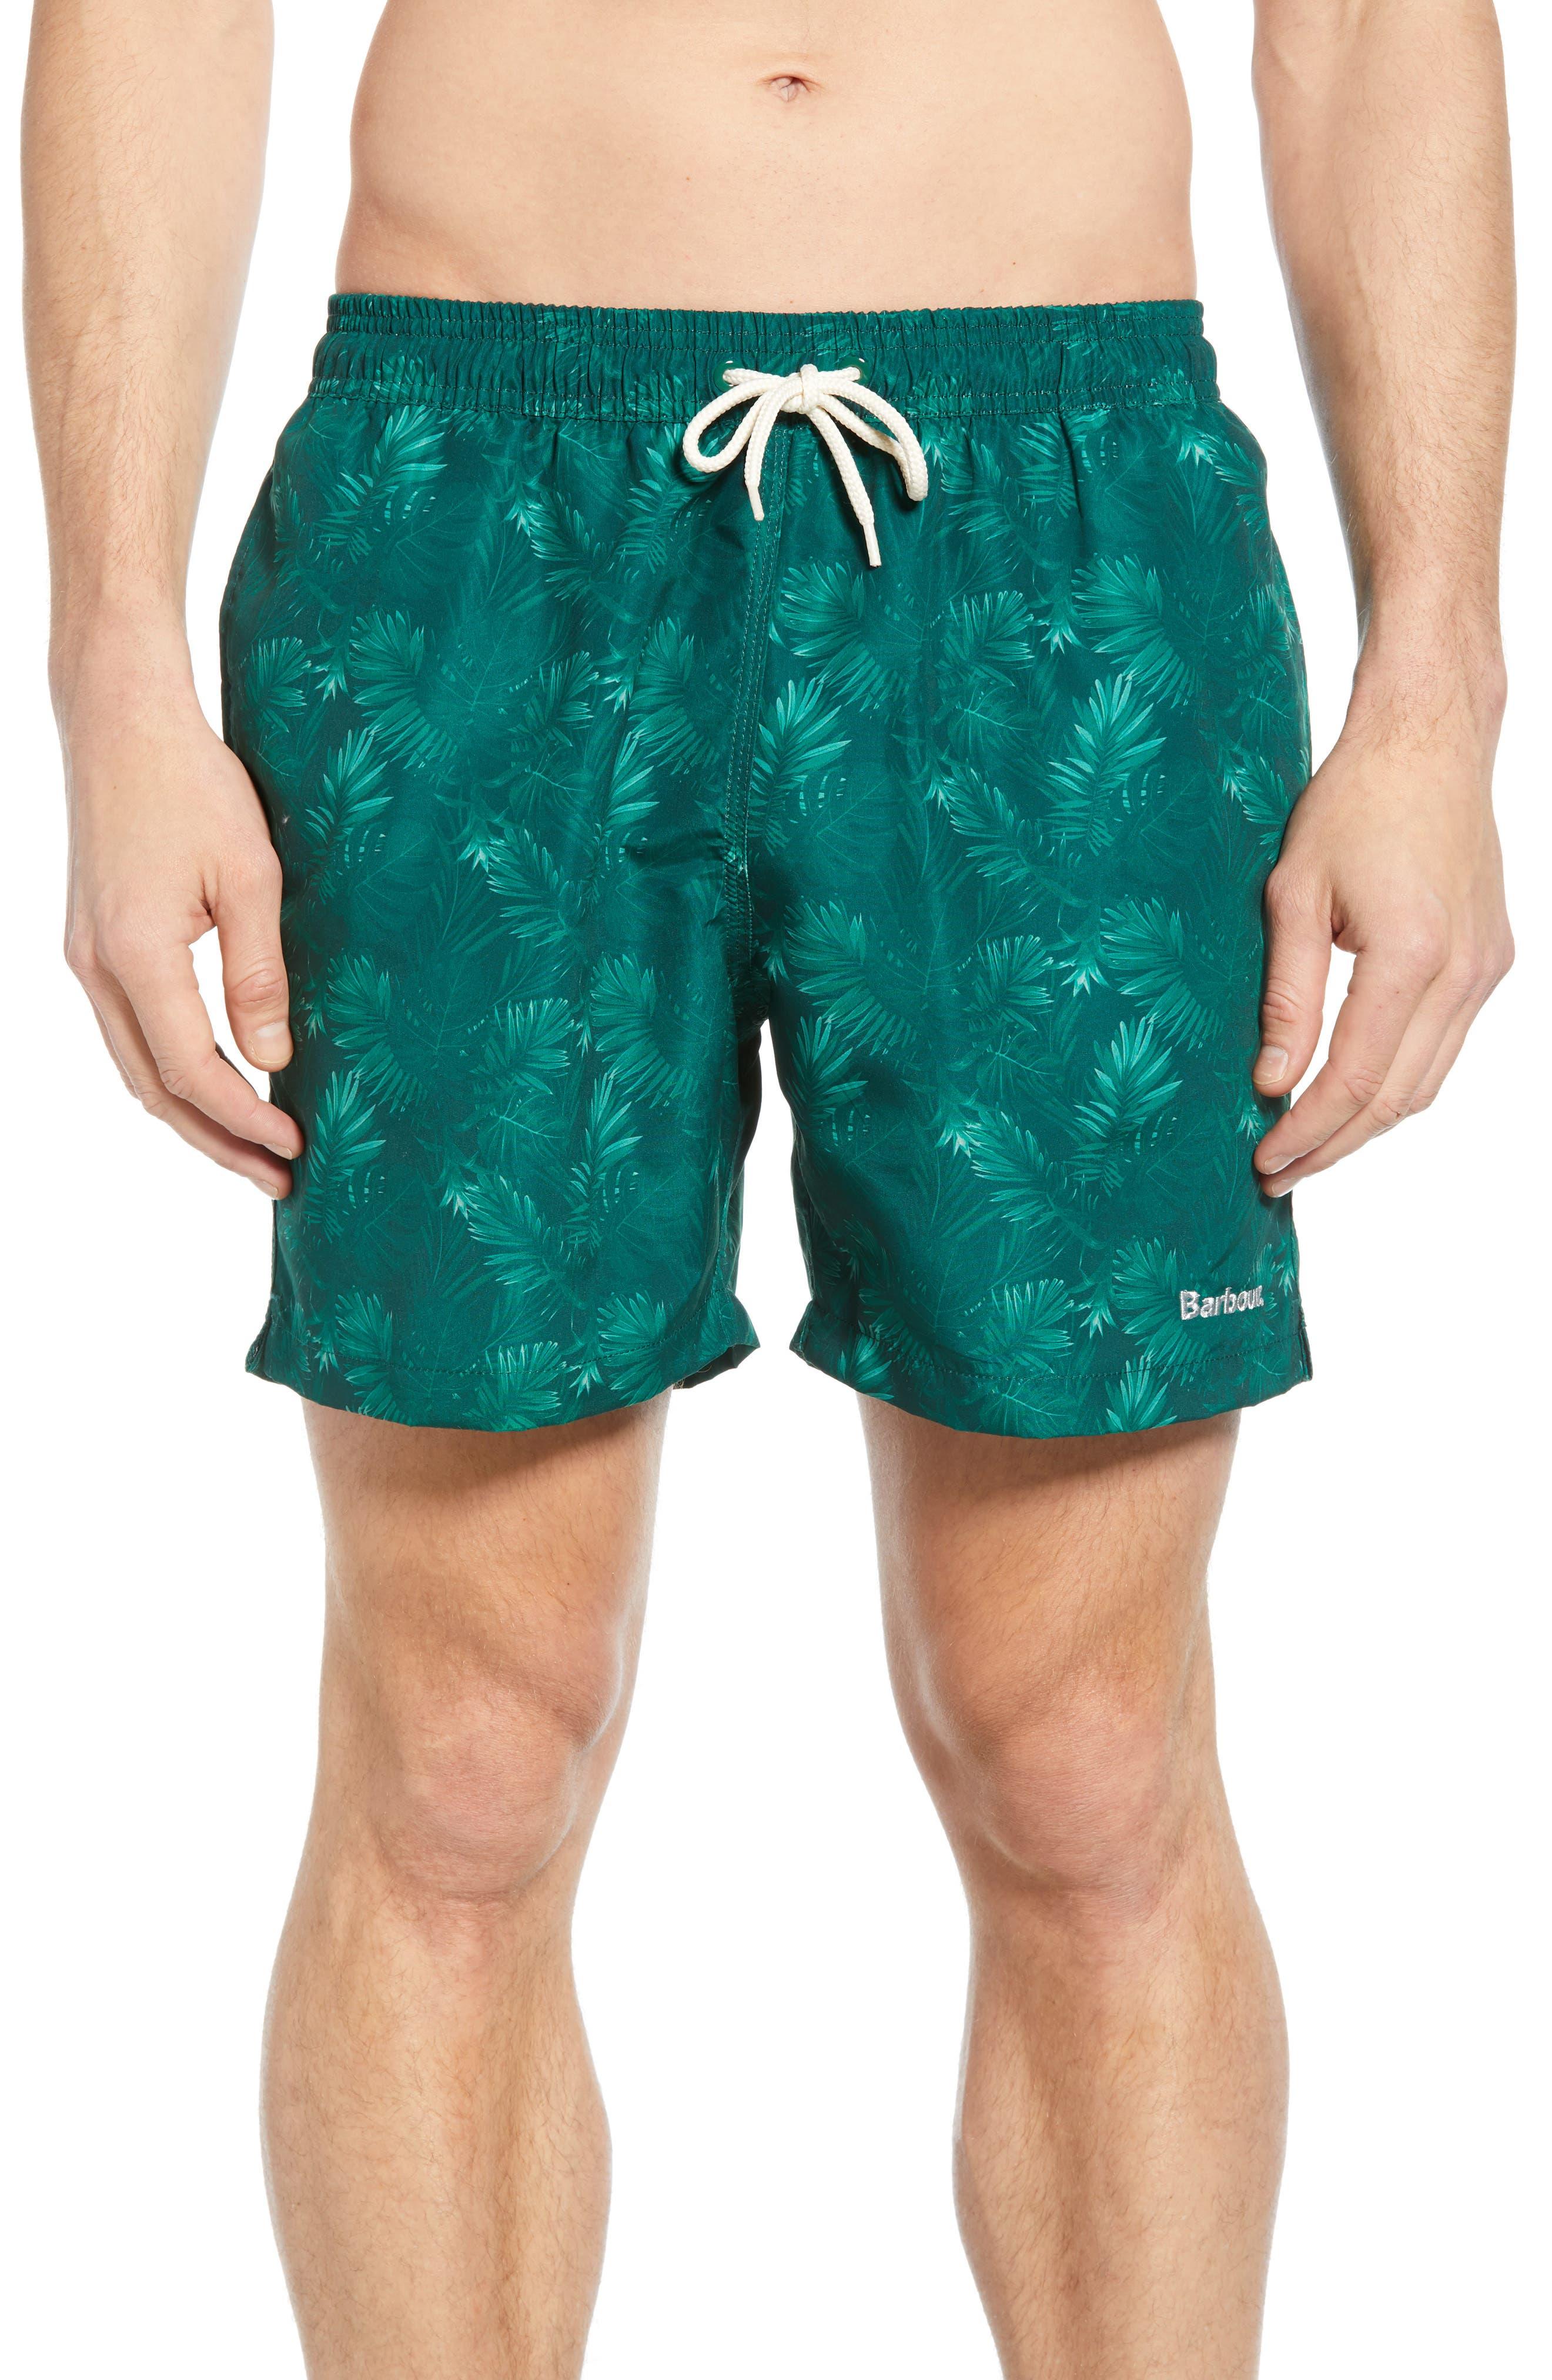 Barbour Tropical Print Swim Trunks, Green